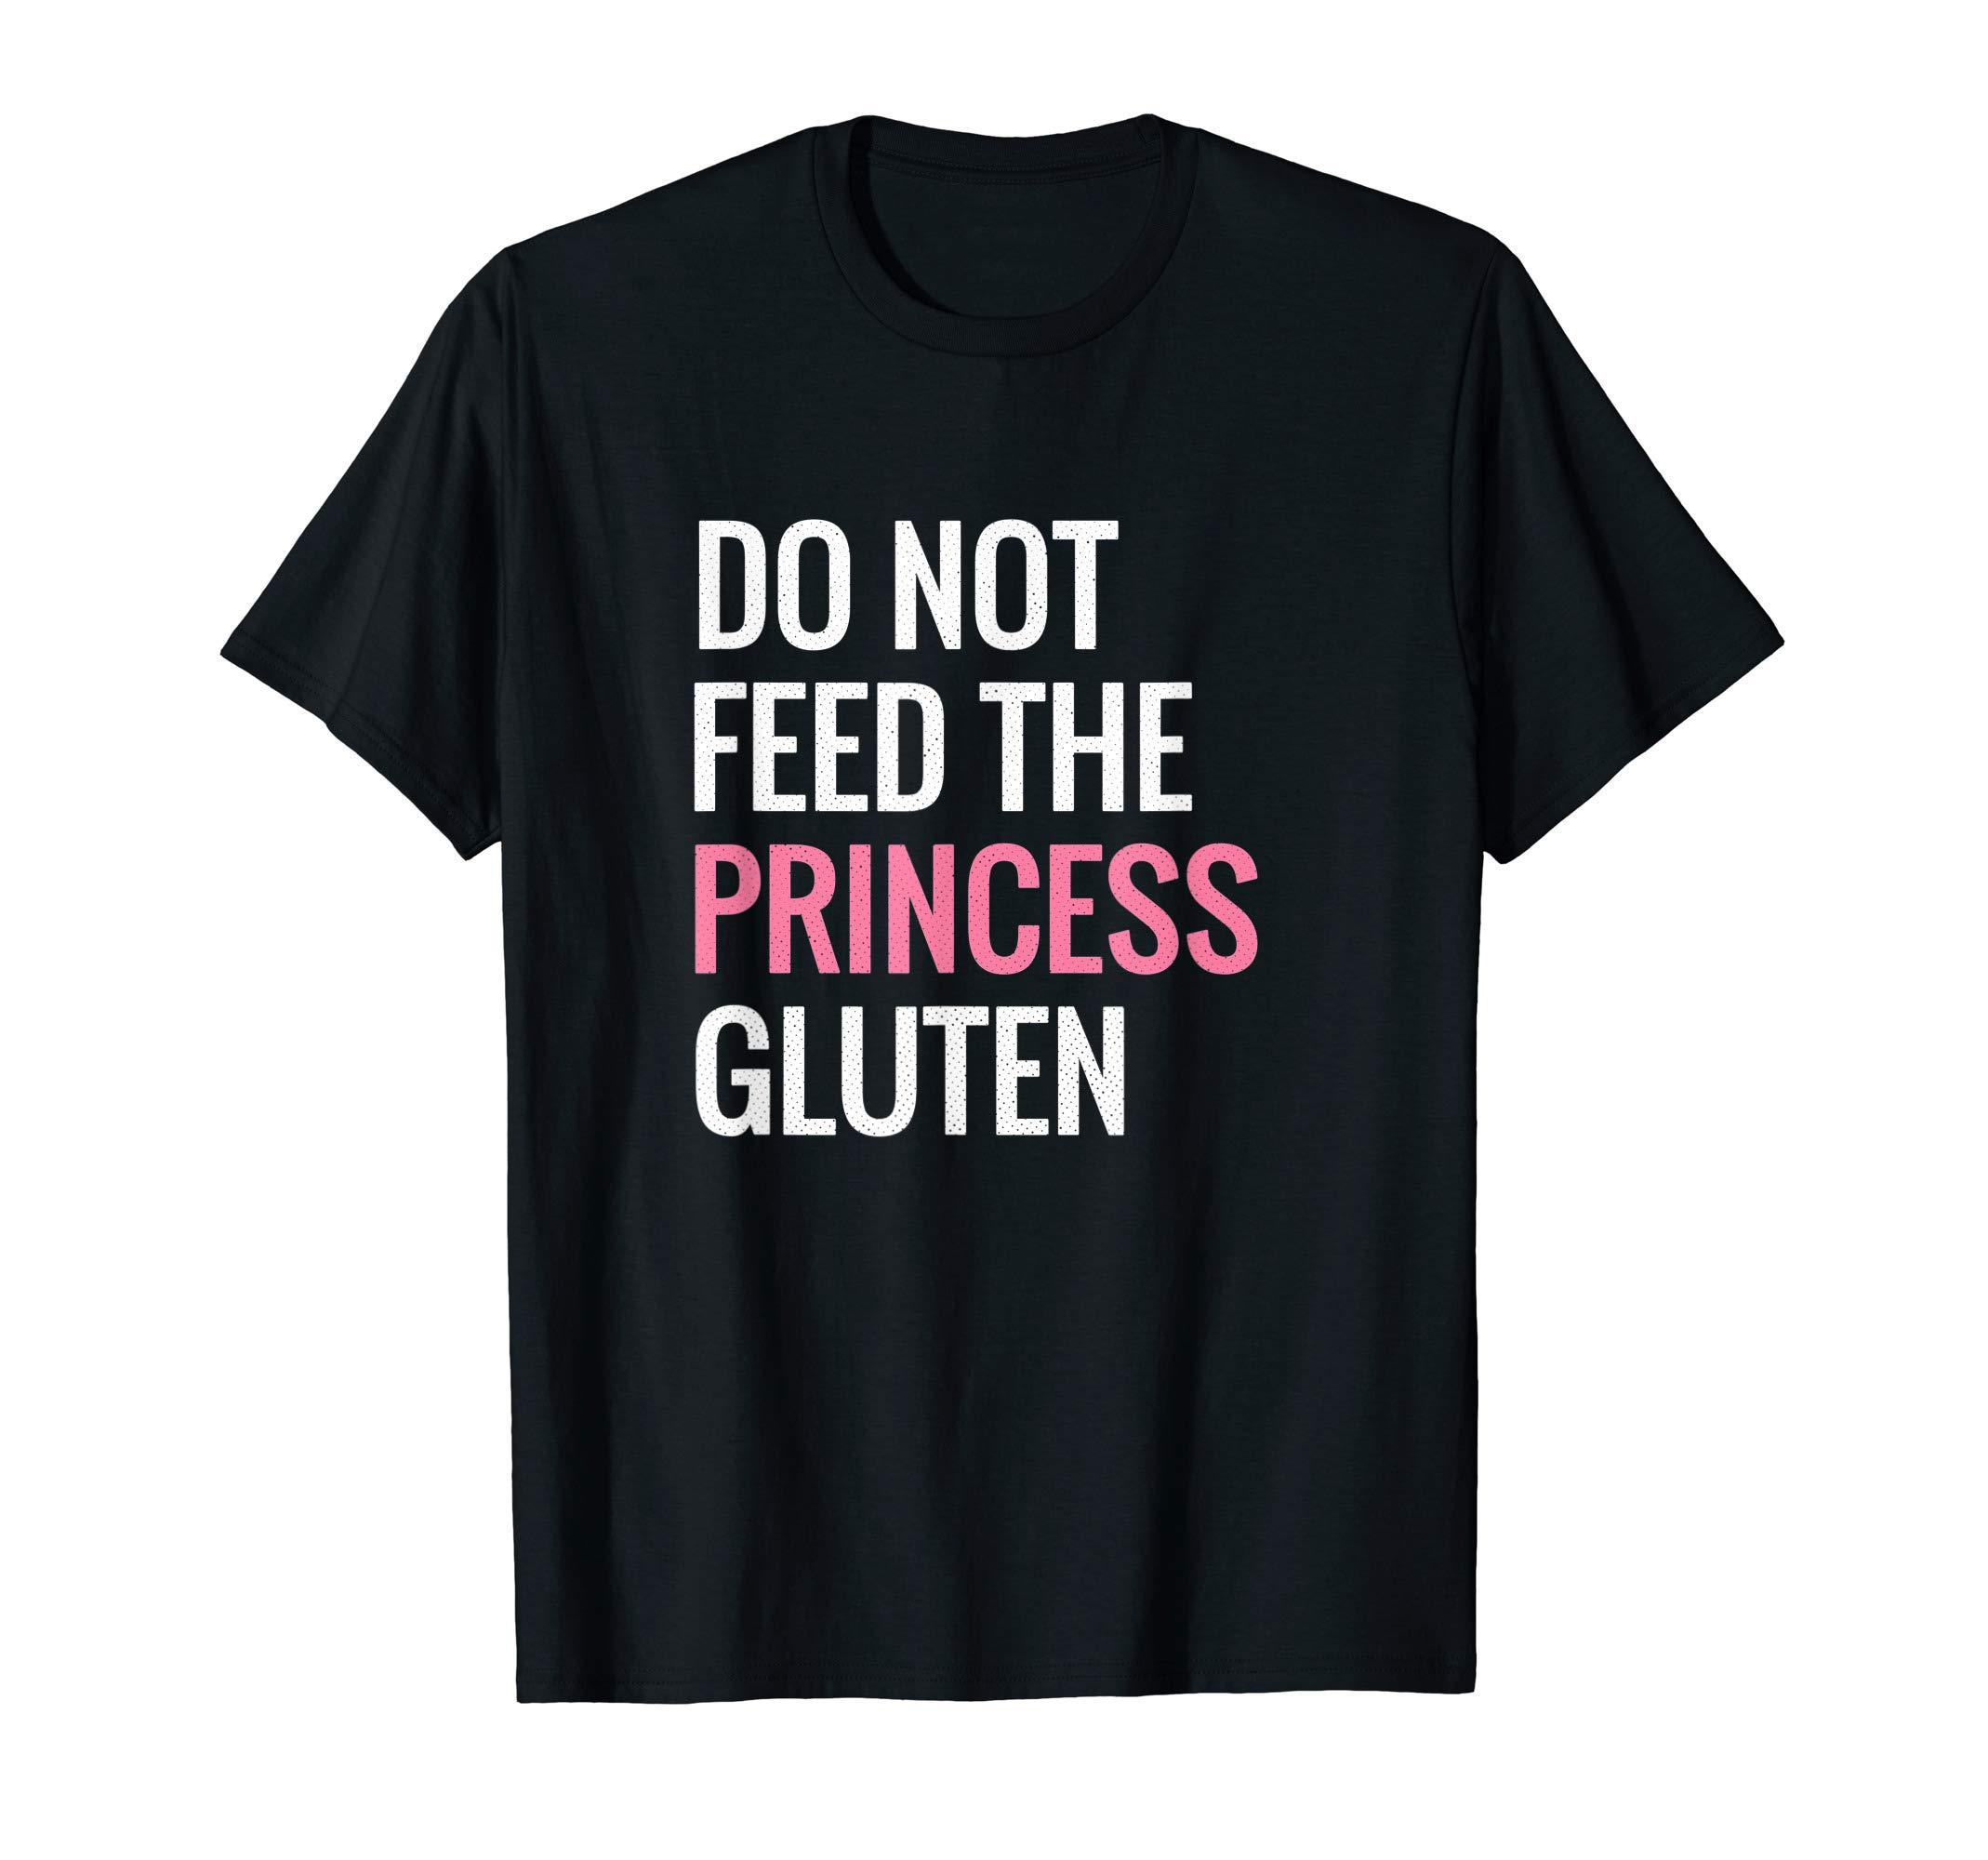 Funny Gluten Free Design Gluten Free Princess Designs T-Shirt by Funny Gluten Free Gift Designs